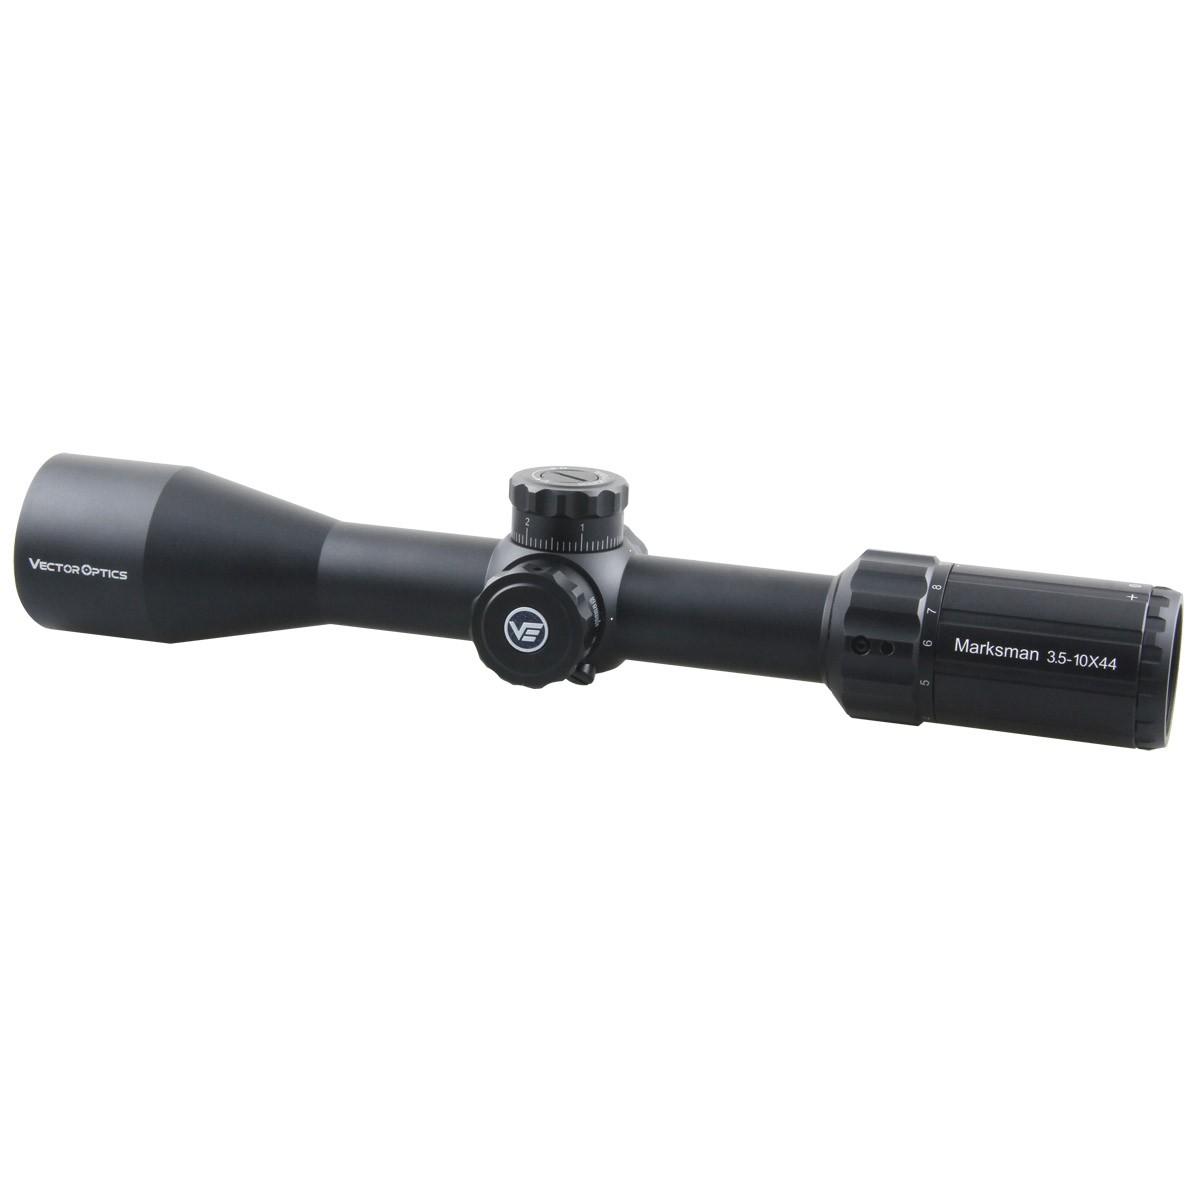 Marksman 3.5-10x44SFP Riflescope